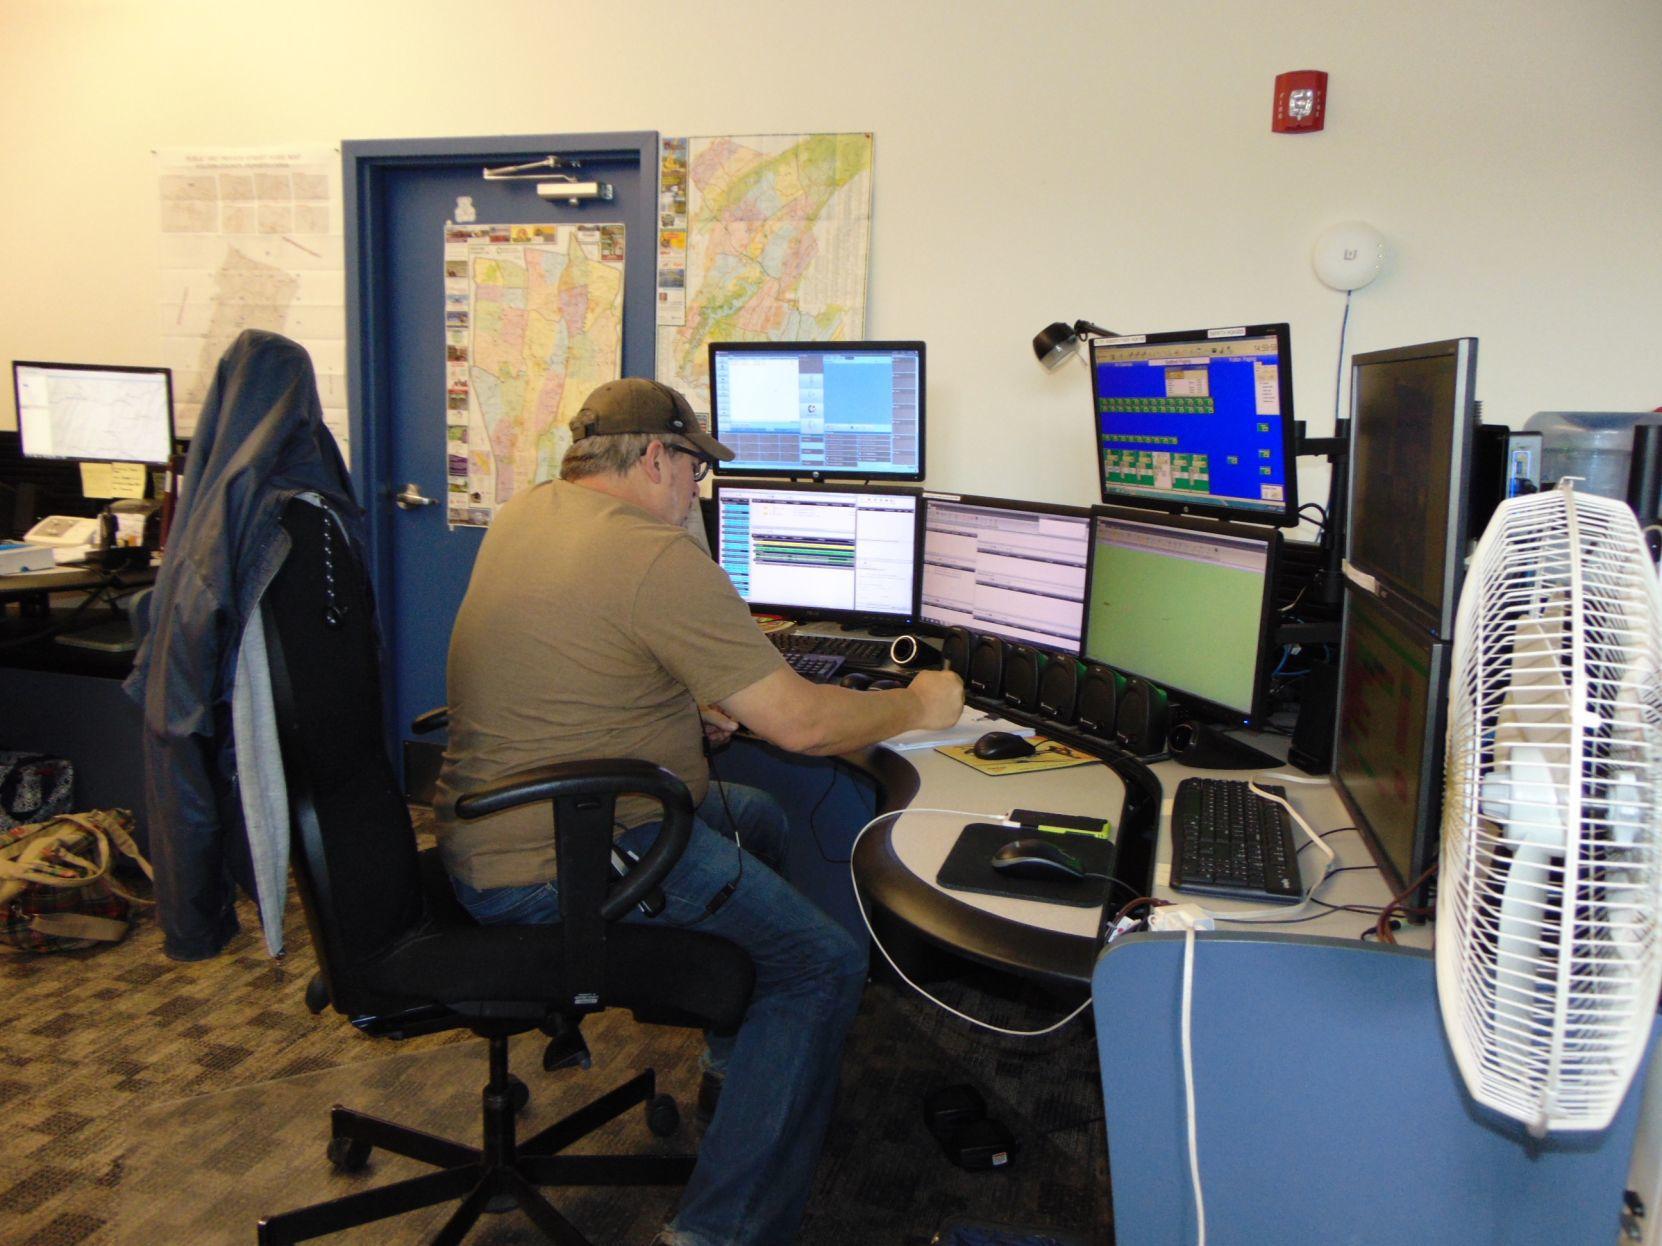 911 center provides vital link